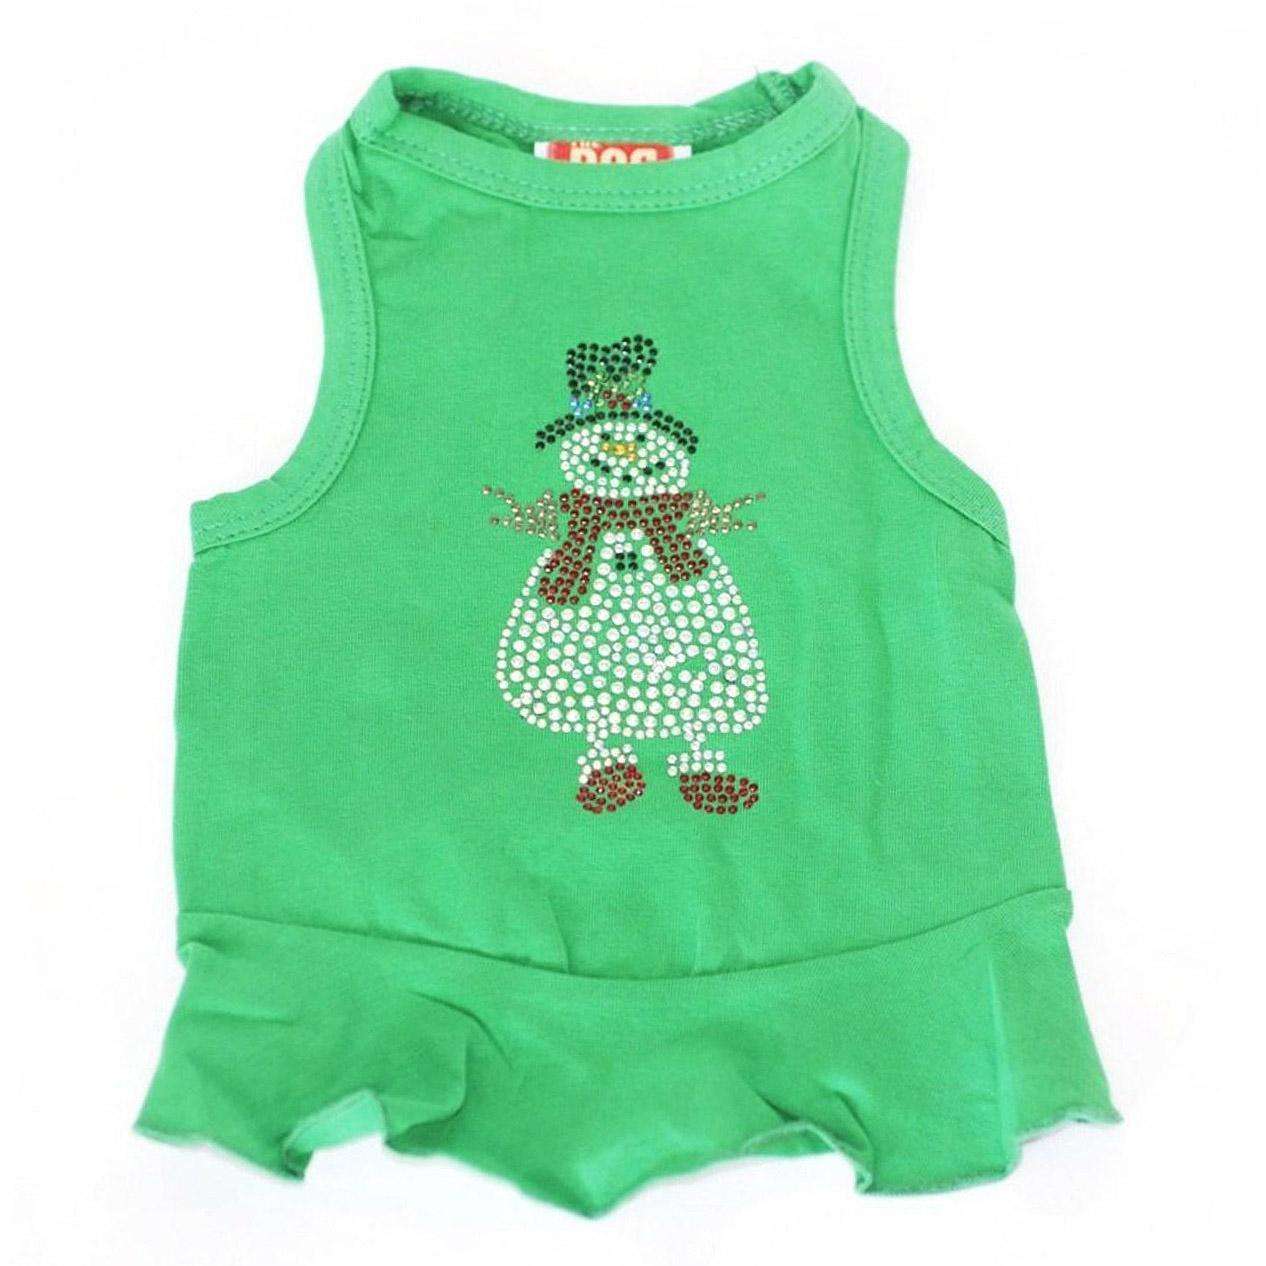 Rhinestone Snowman Holiday Dog Dress - Green